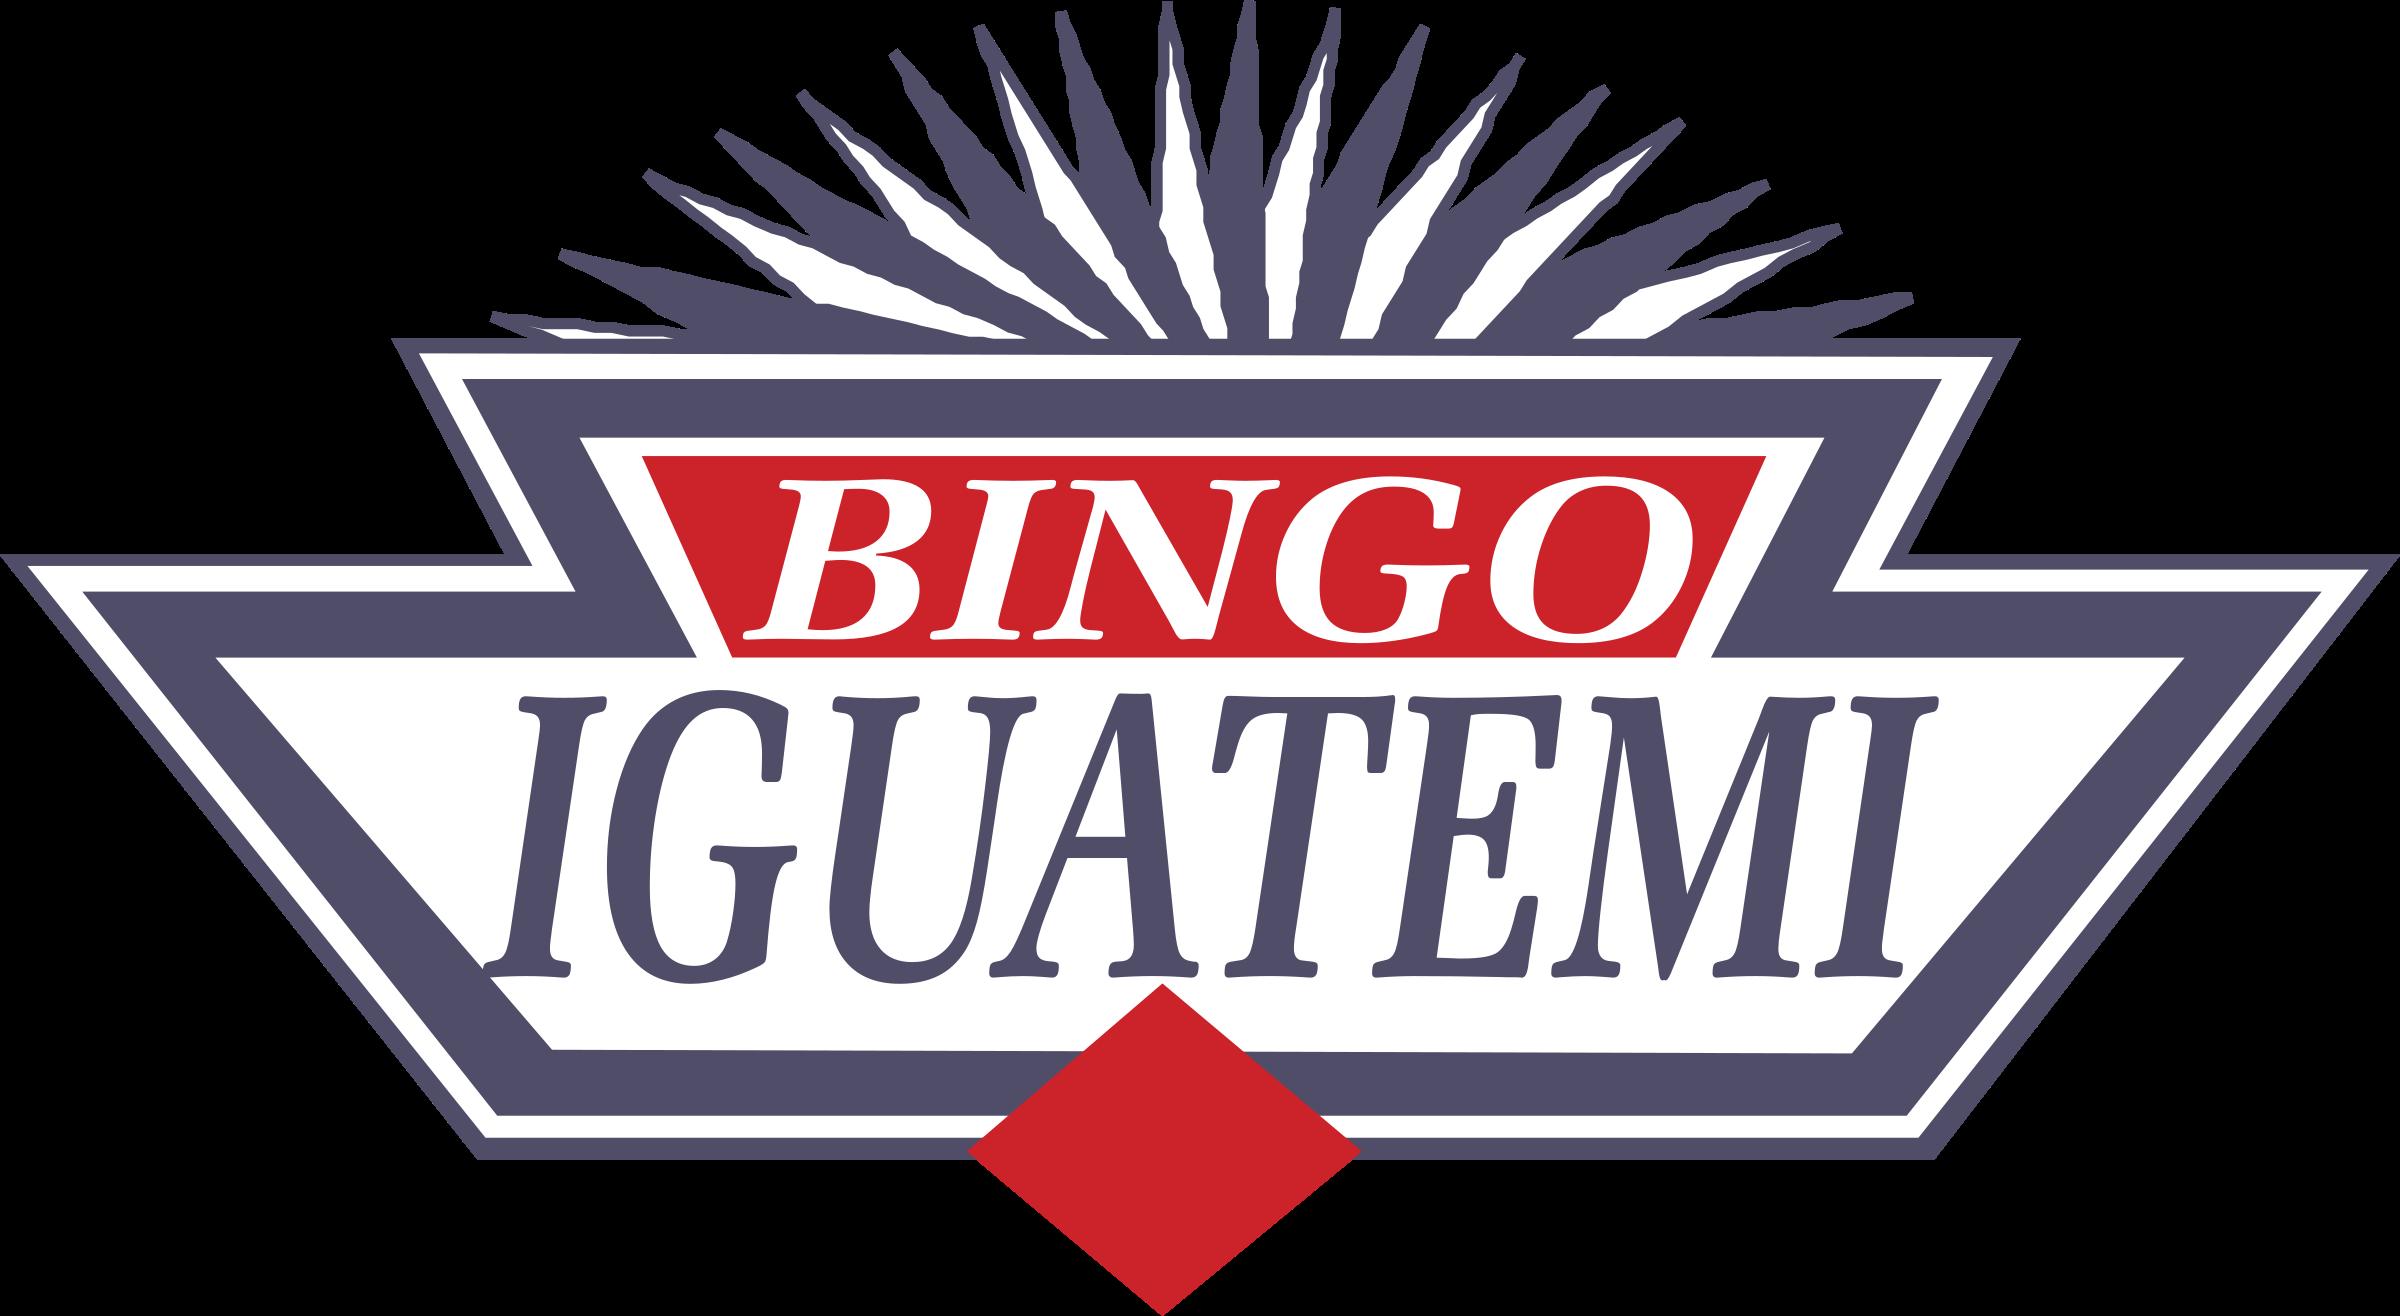 clipart freeuse Bingo vector. Iguatemi logo png transparent